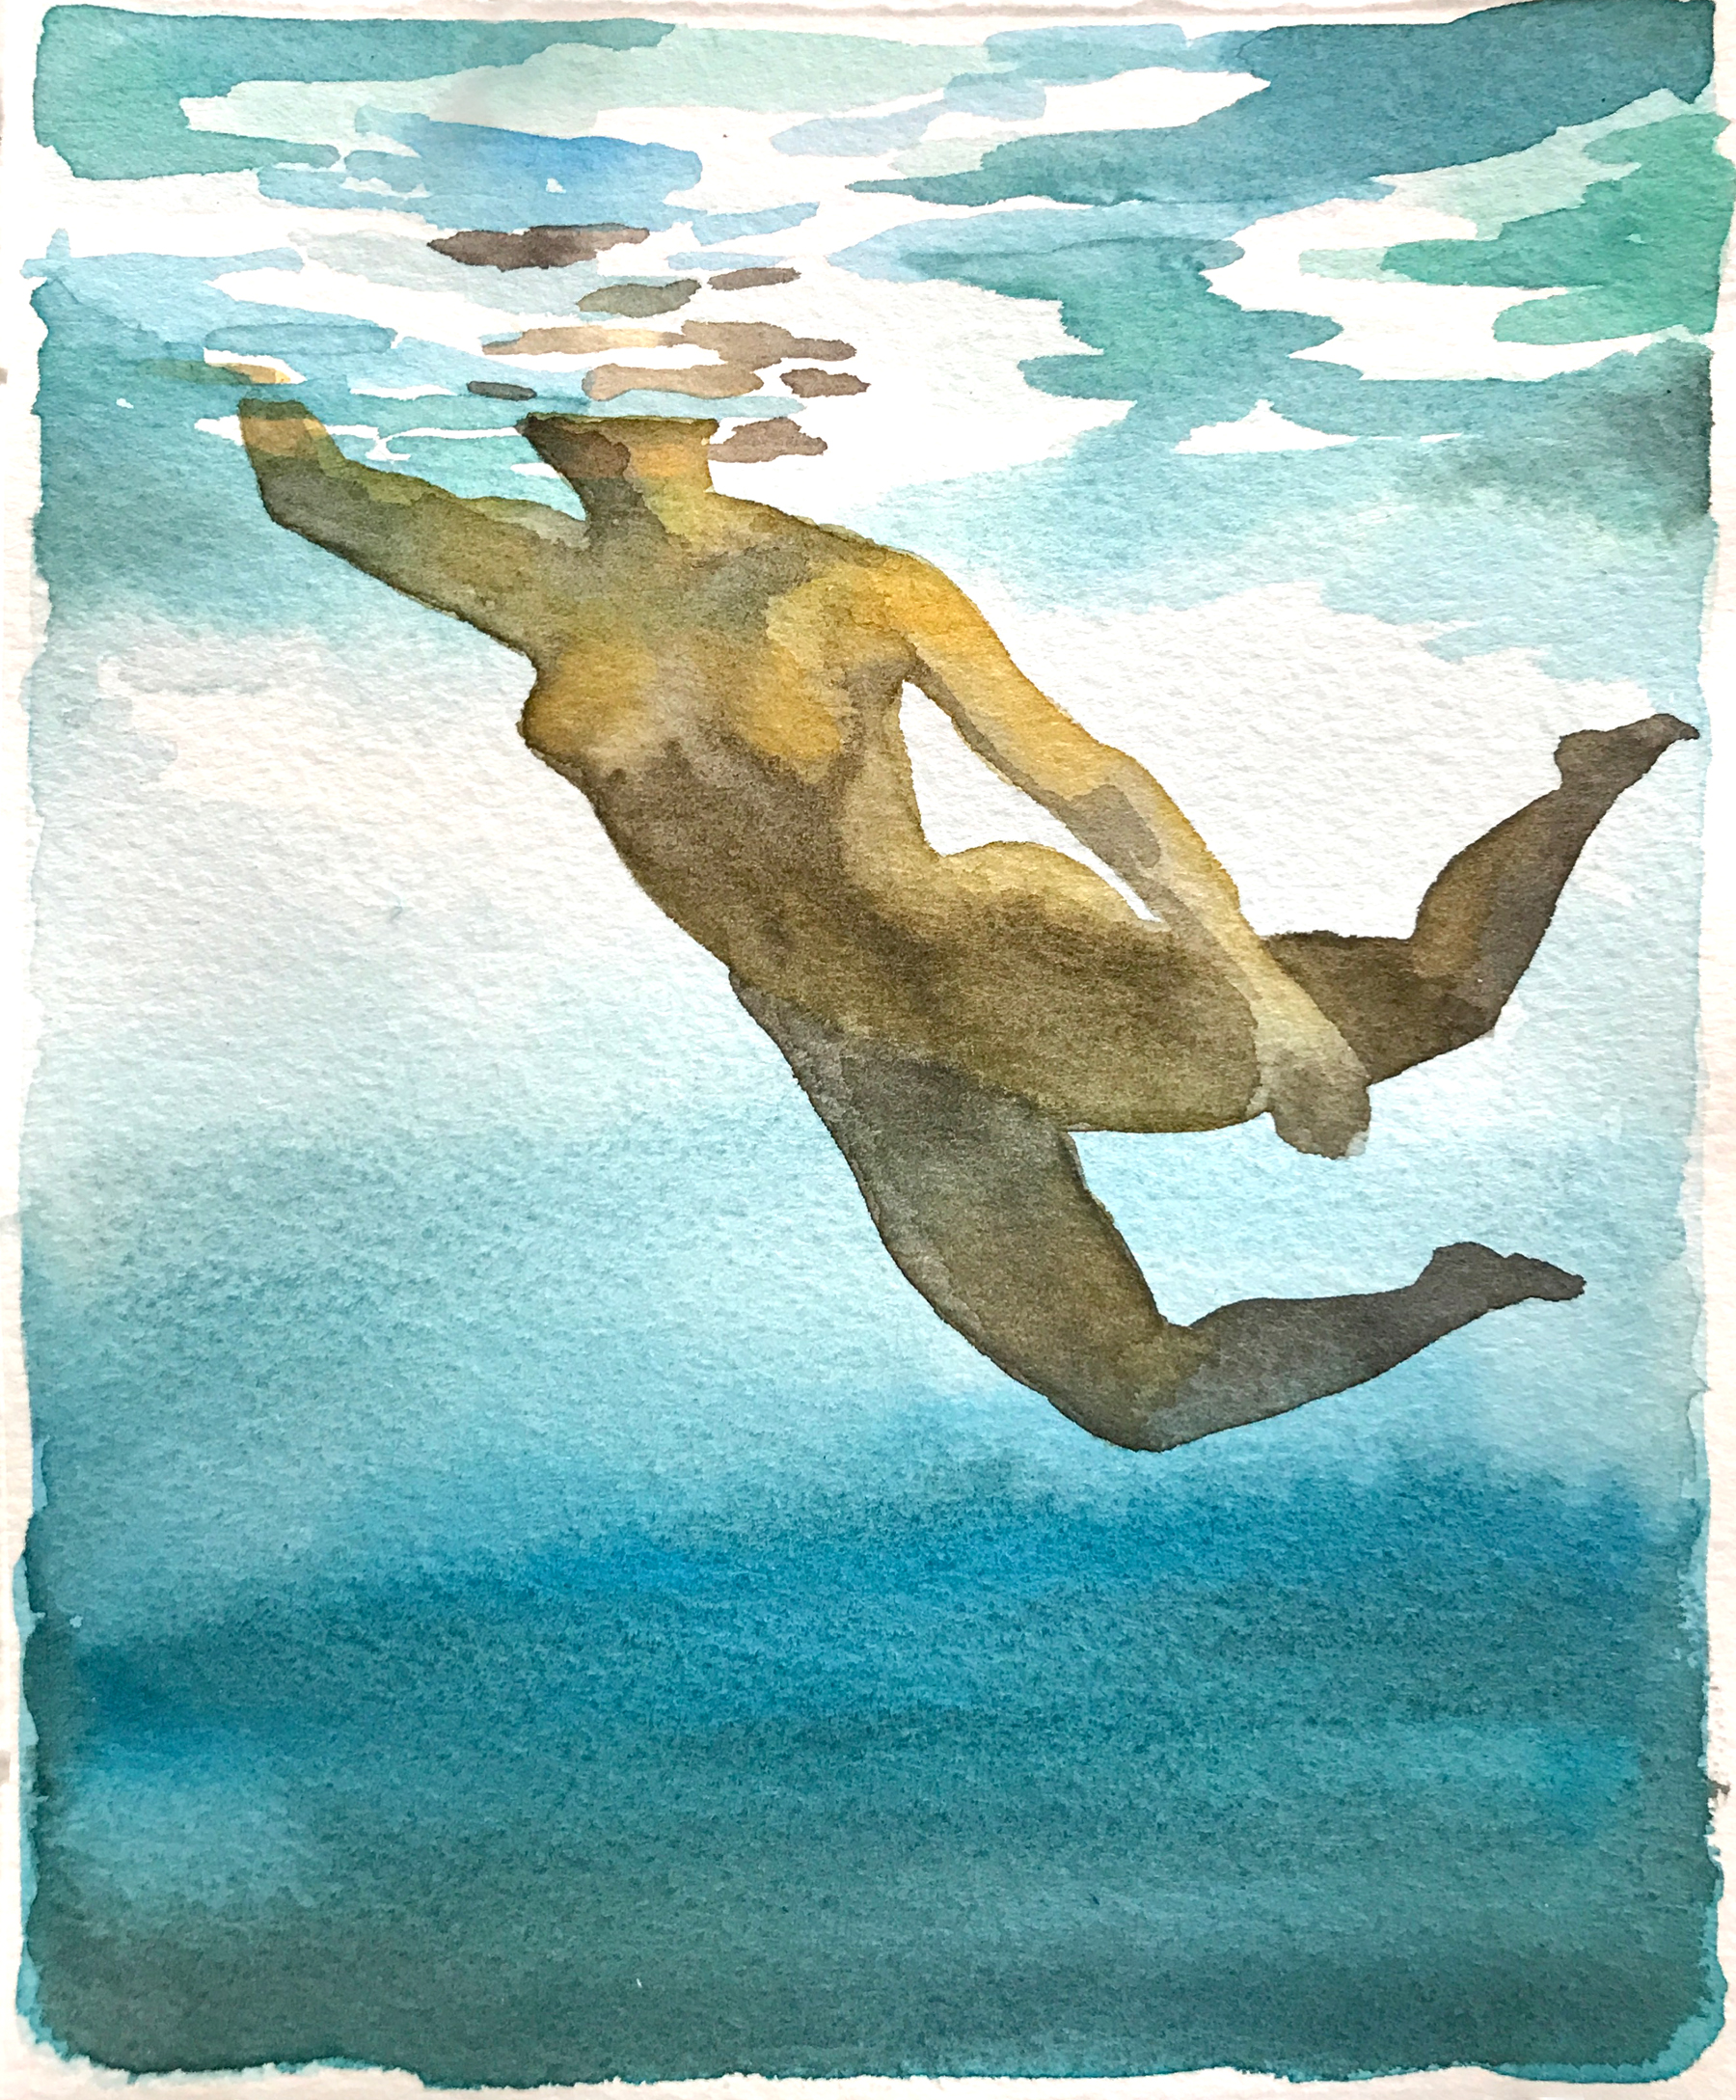 watercolor swimmer.jpg